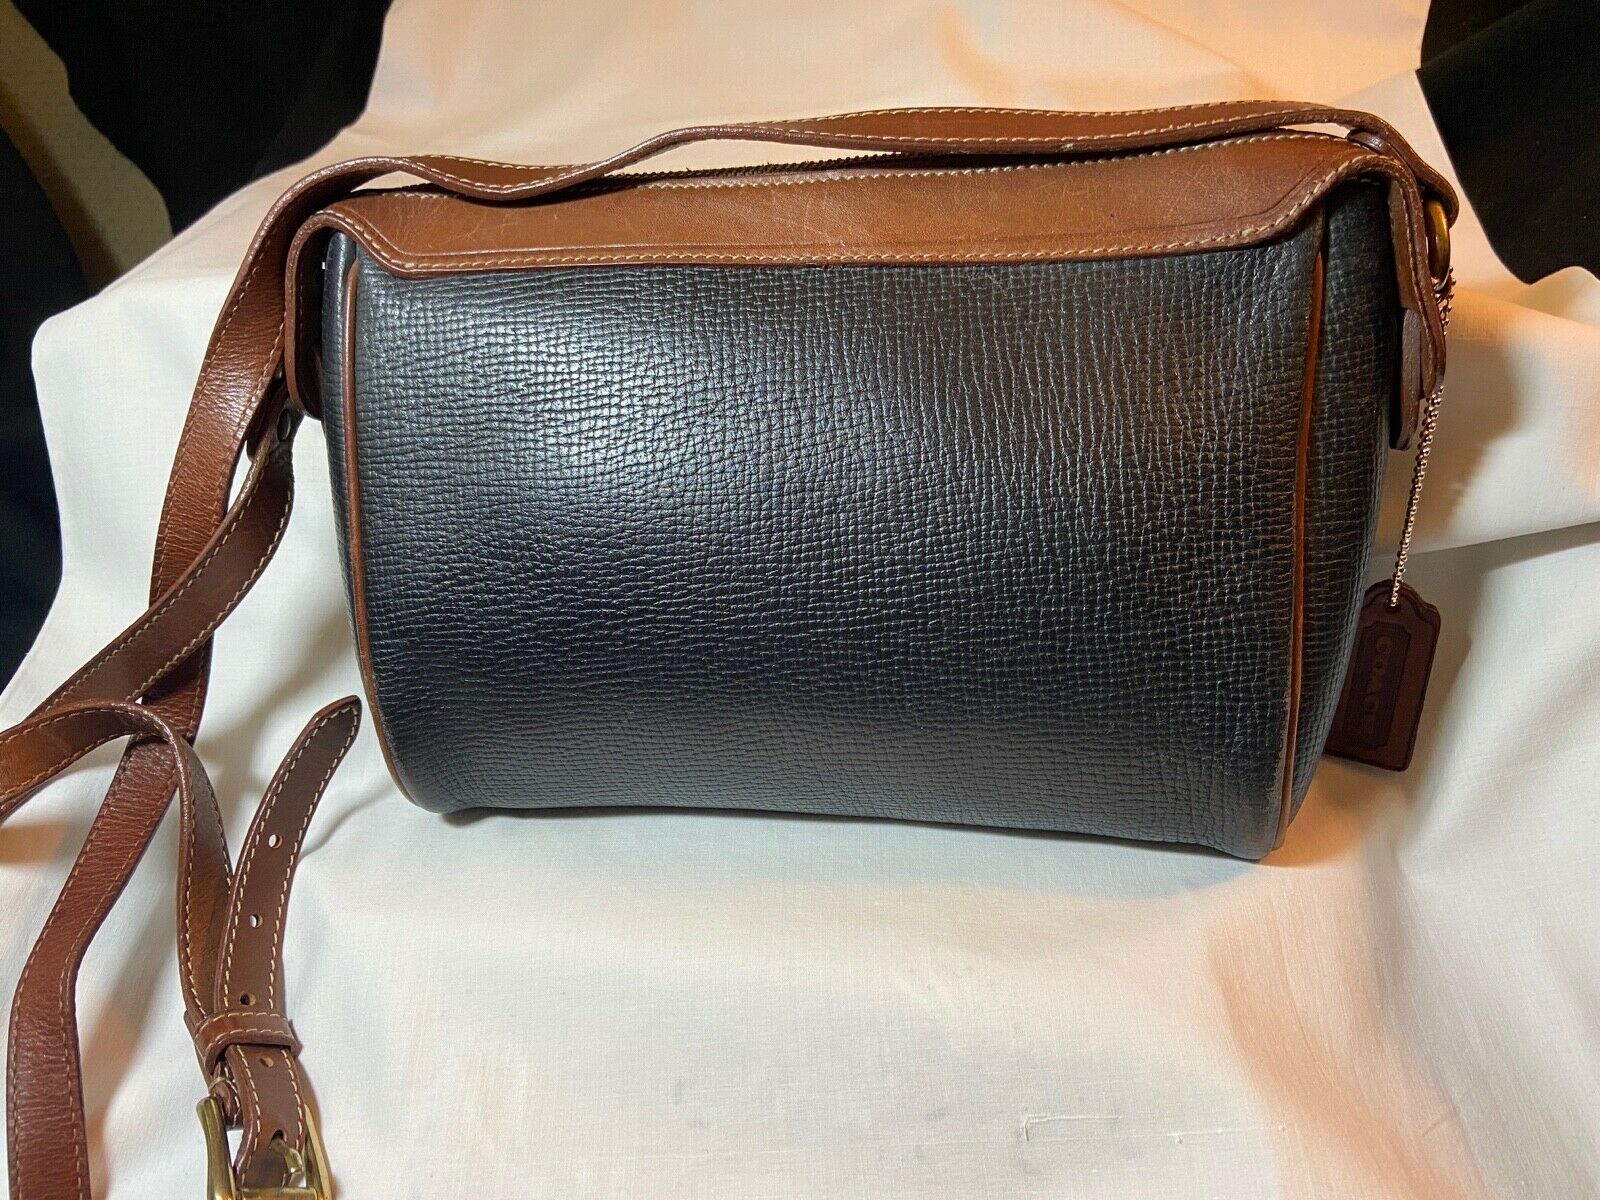 Vintage Coach Black & Brown Classic Zip Top Pebble Leather Shoulder/Crossbody